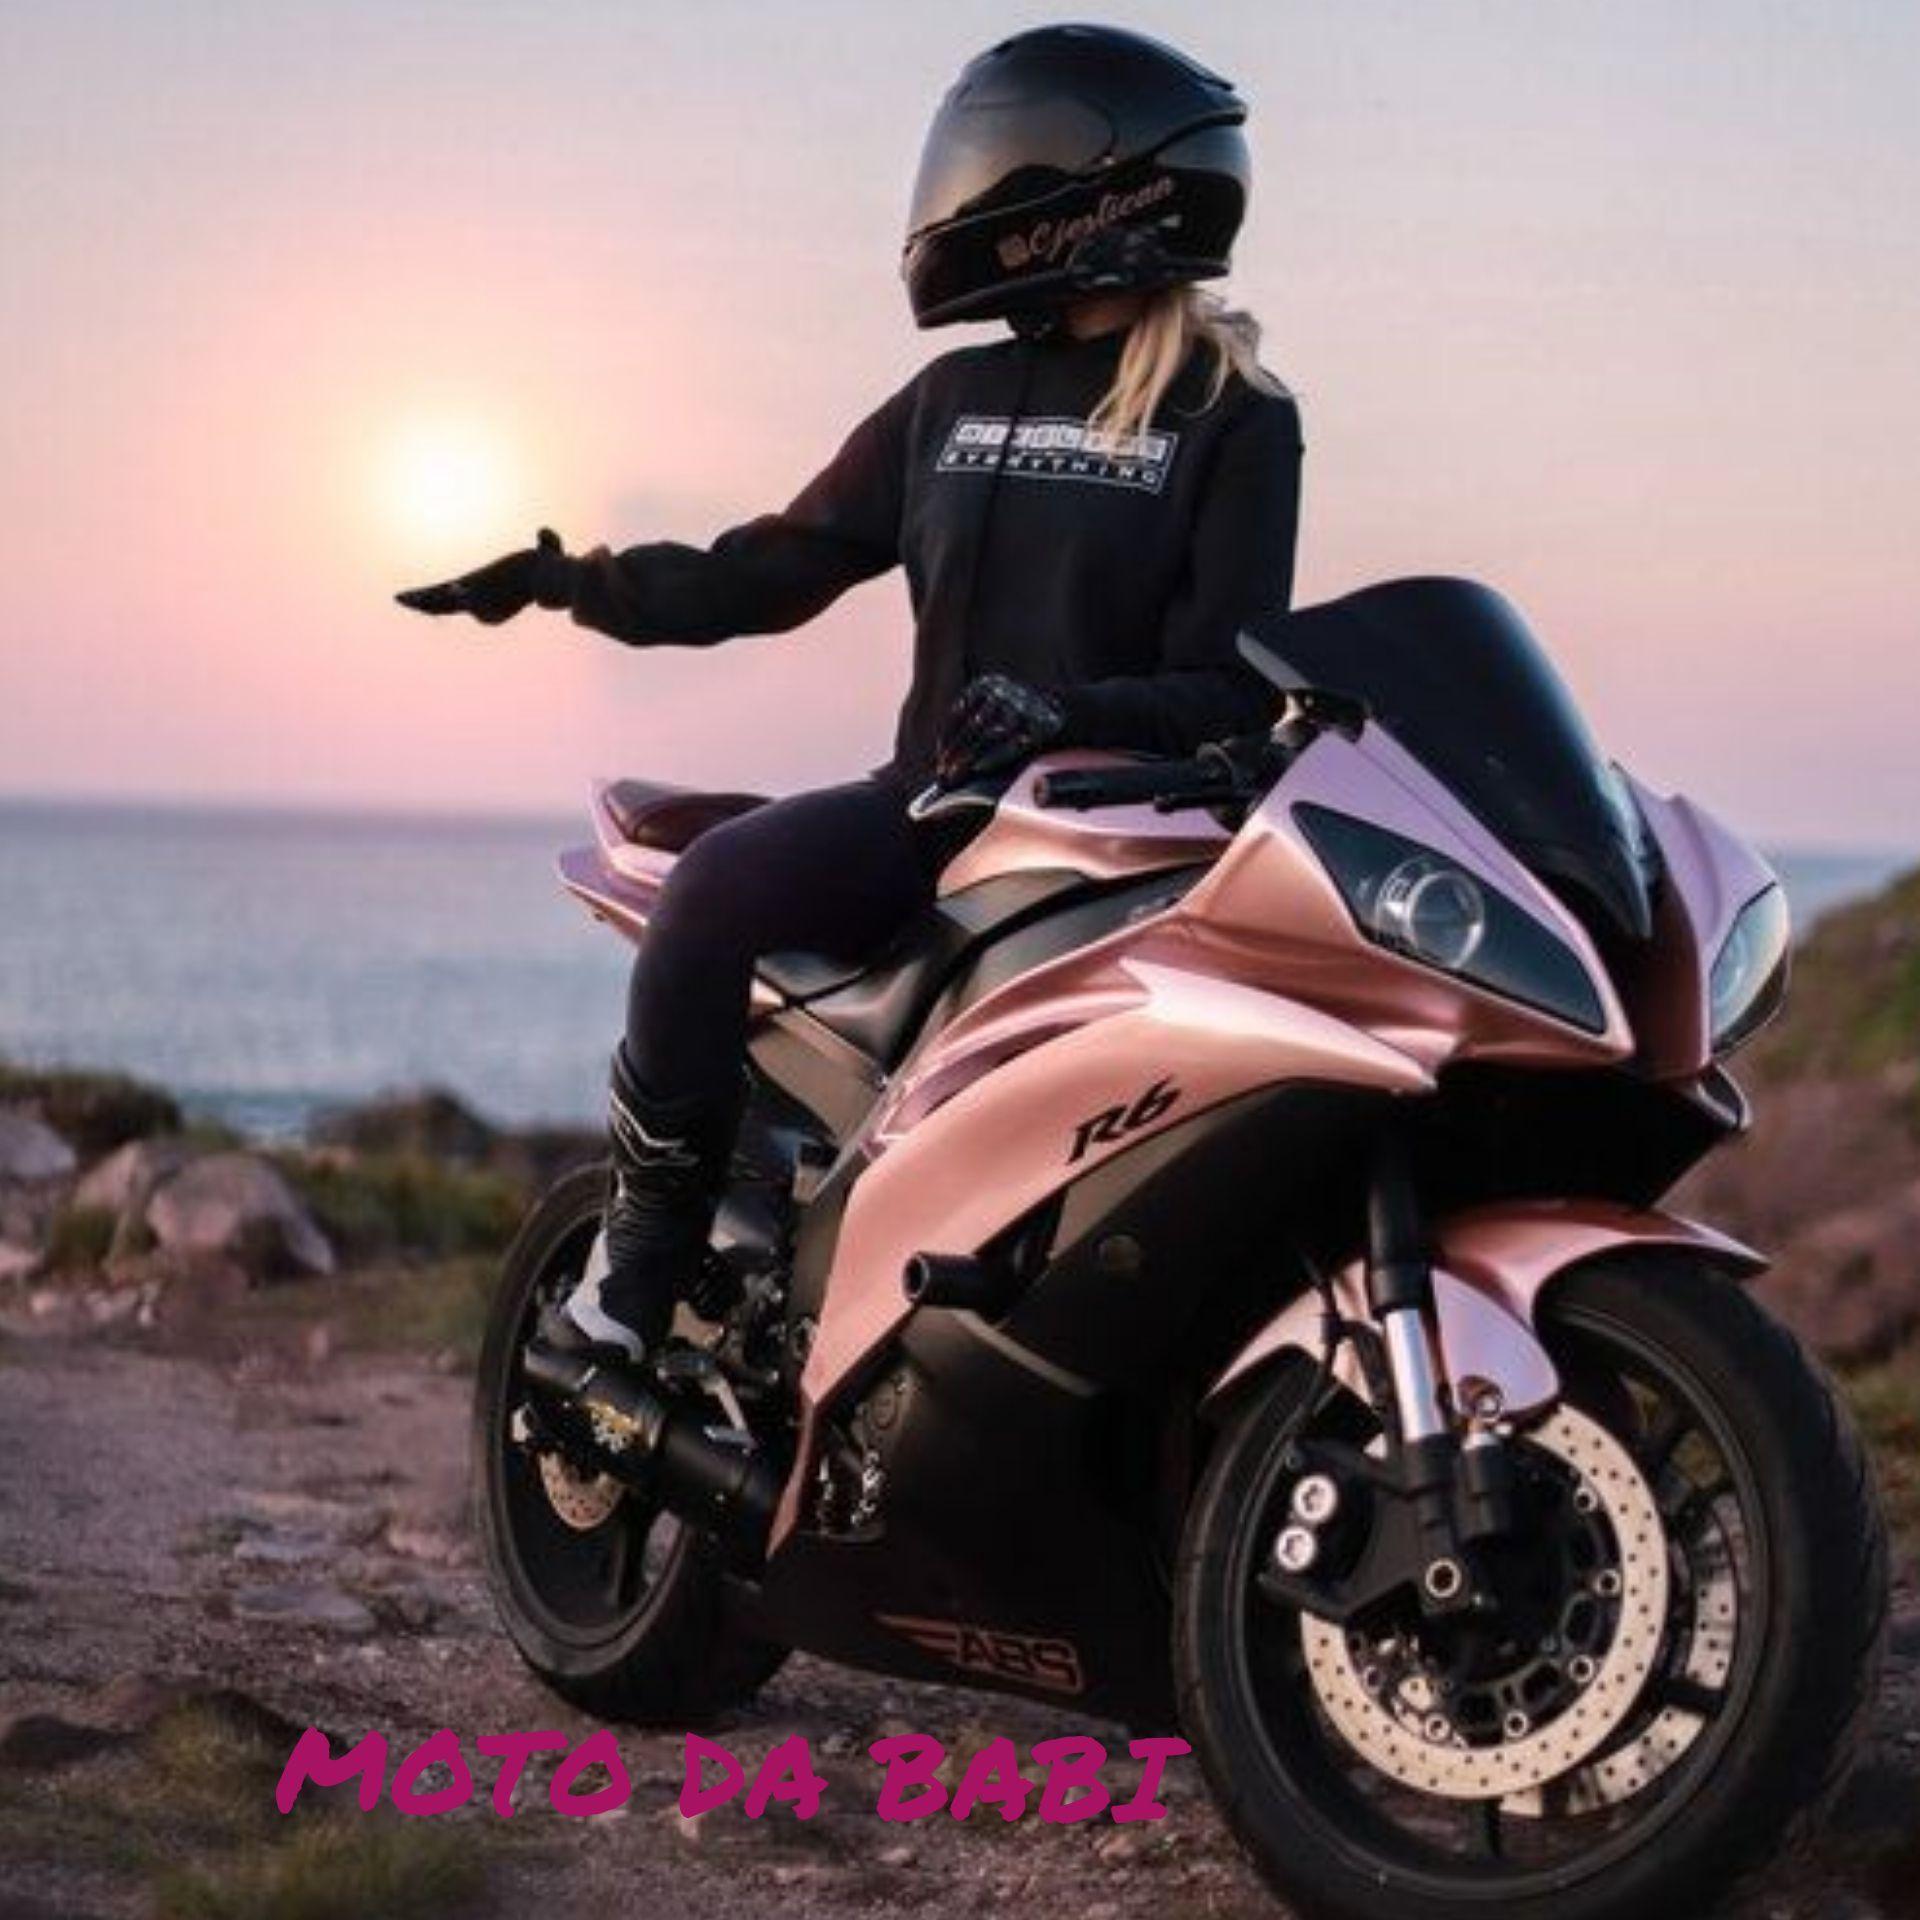 Casal Mandrake Babictor In 2021 Sports Bikes Motorcycles Motorbike Girl Motorcycle Wallpaper